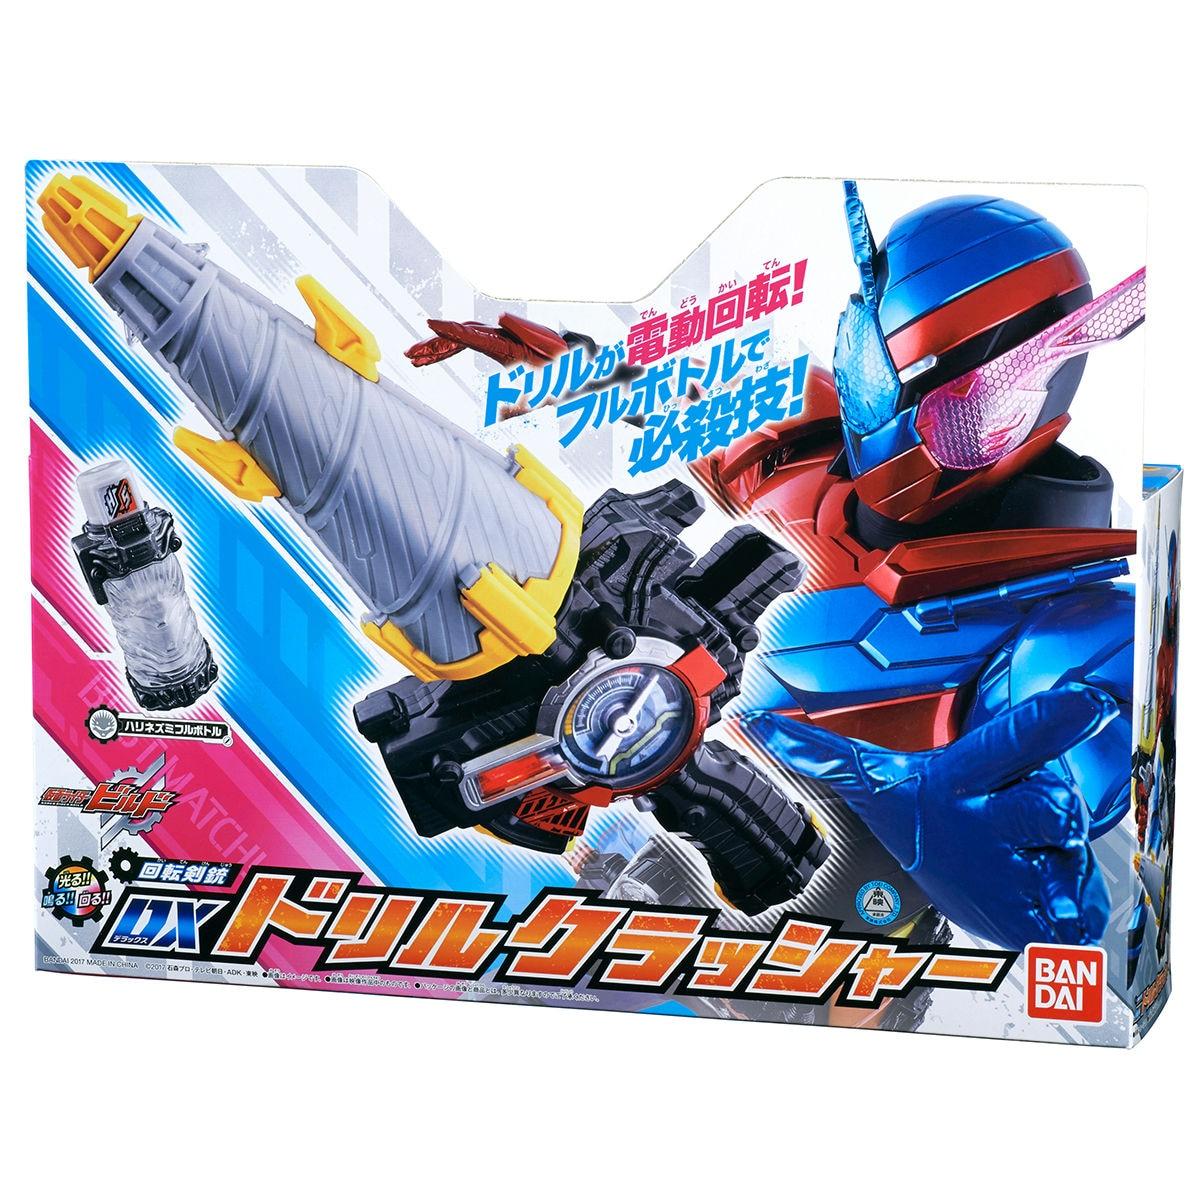 Kamens ライダー構築ドリル Smasher DX 武器リンクすることがフルボトルアクション図クリスマスギフト子供のためのアクション & トイ フィギュア   -